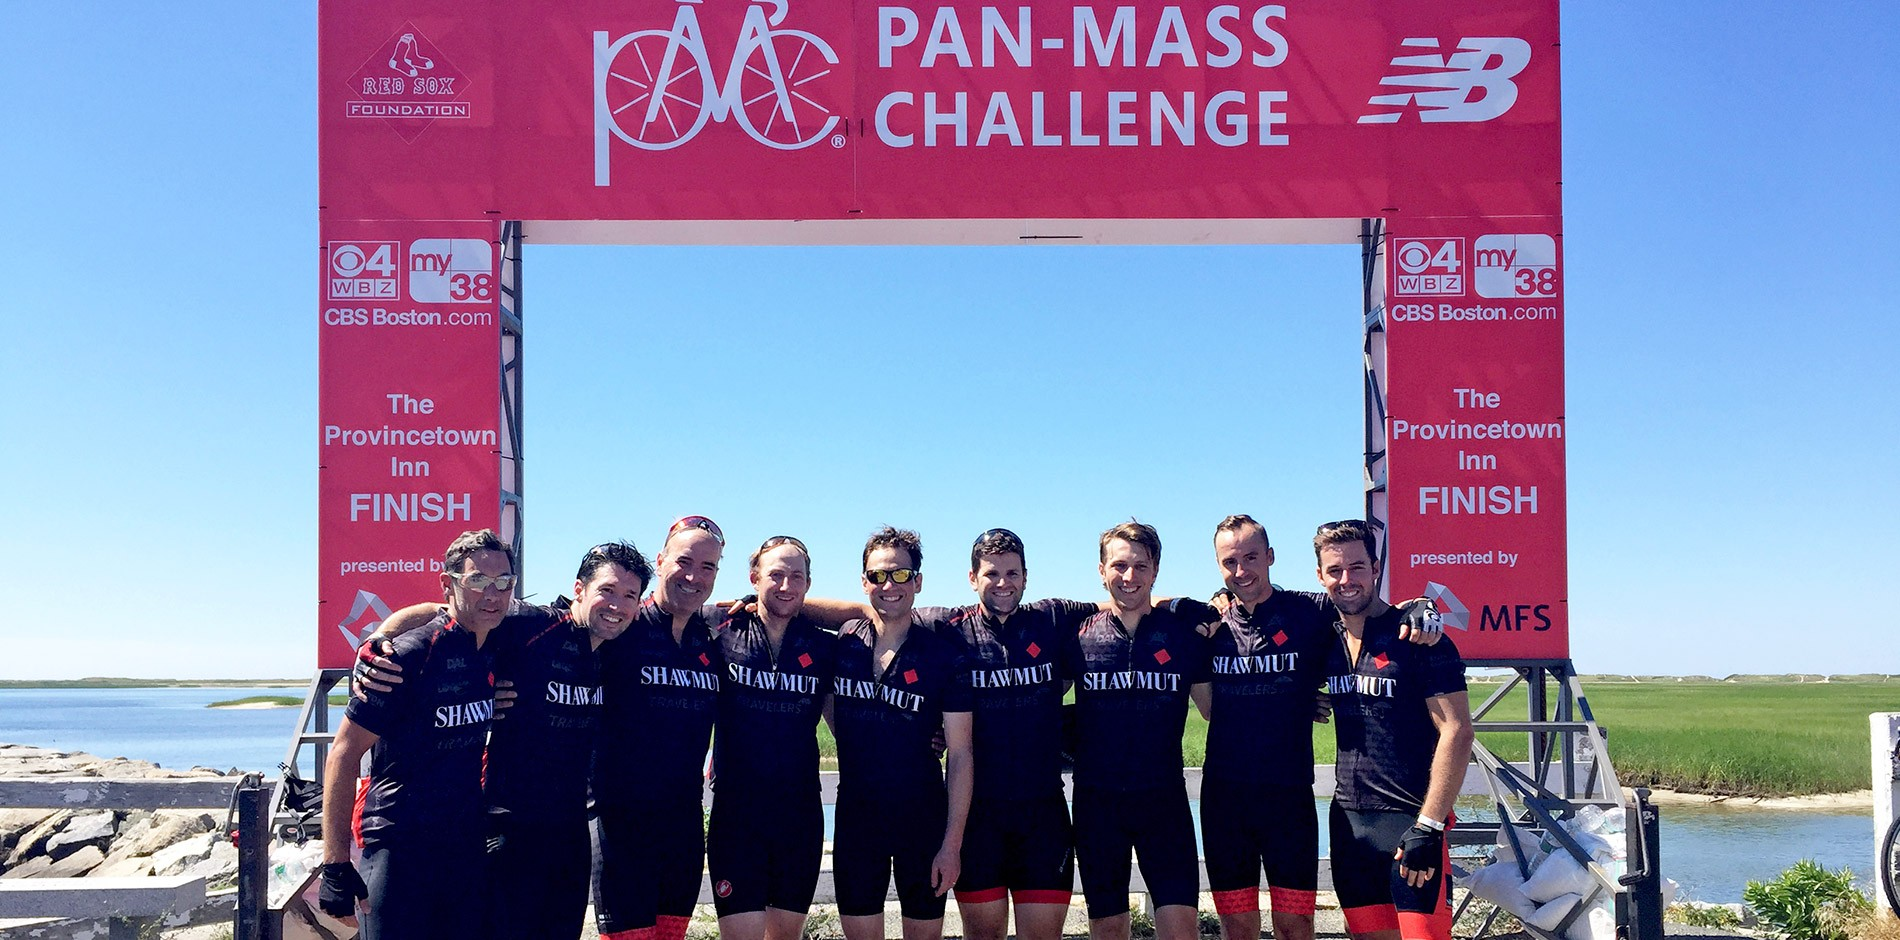 Pan mass challenge dates